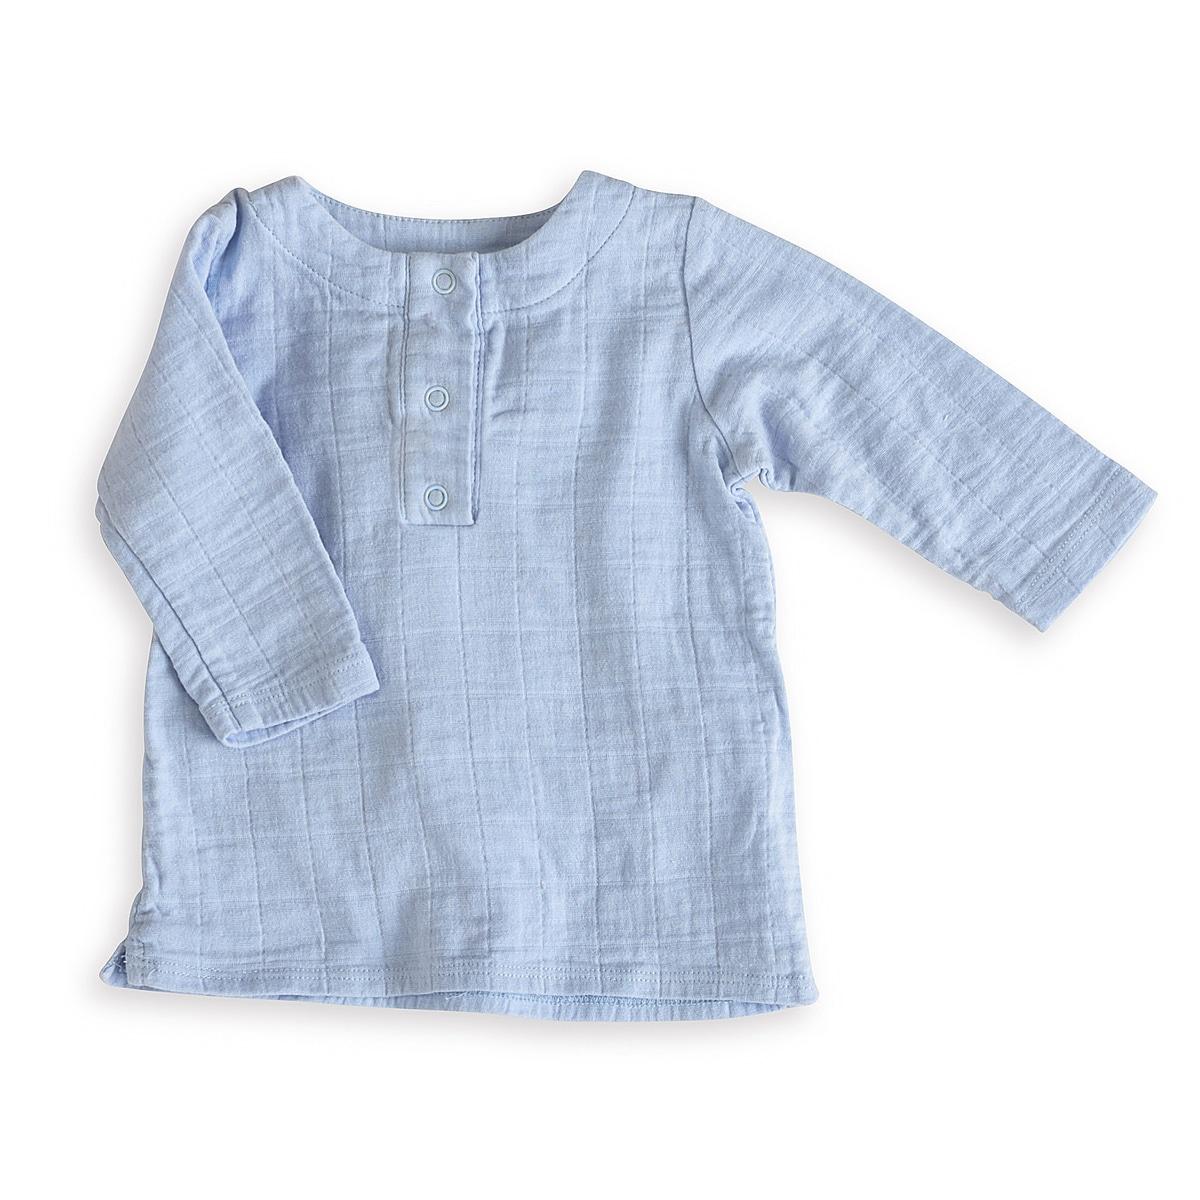 aden + anais Boys 6-9 Months Night Sky Blue Muslin Tunic Top